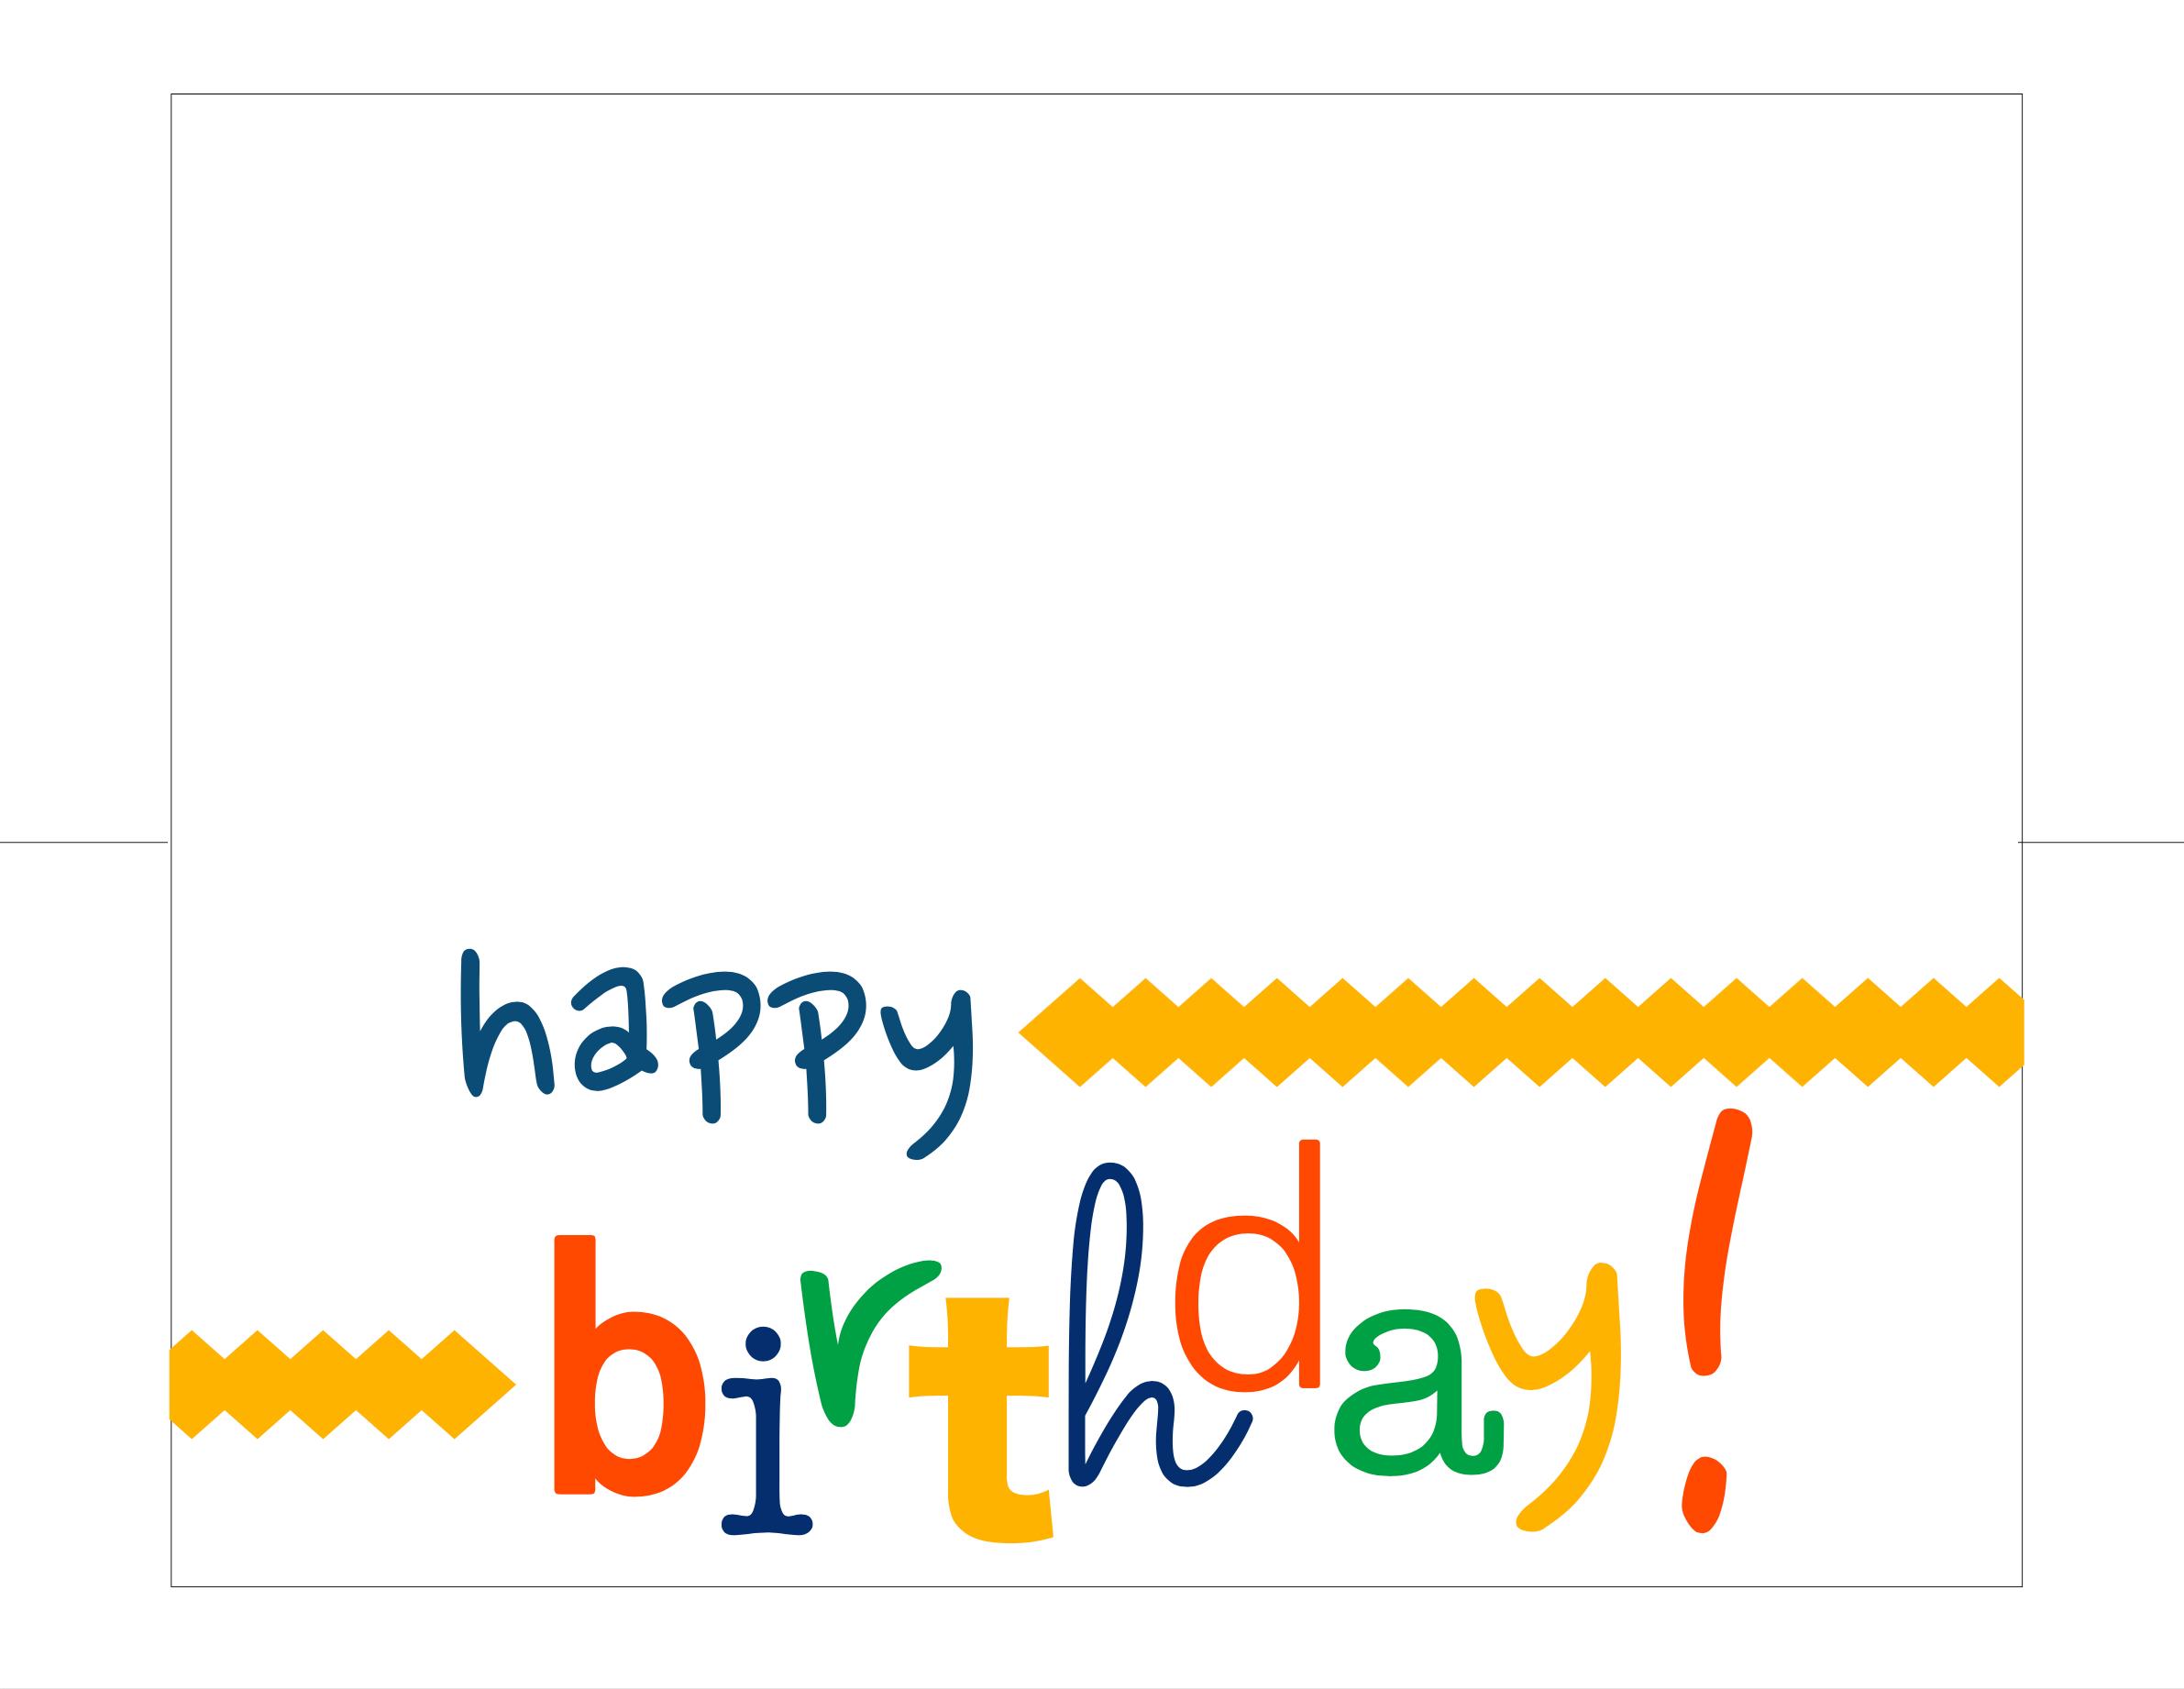 Happy Birthday Card Free Printable - - Happy Birthday Free Printable